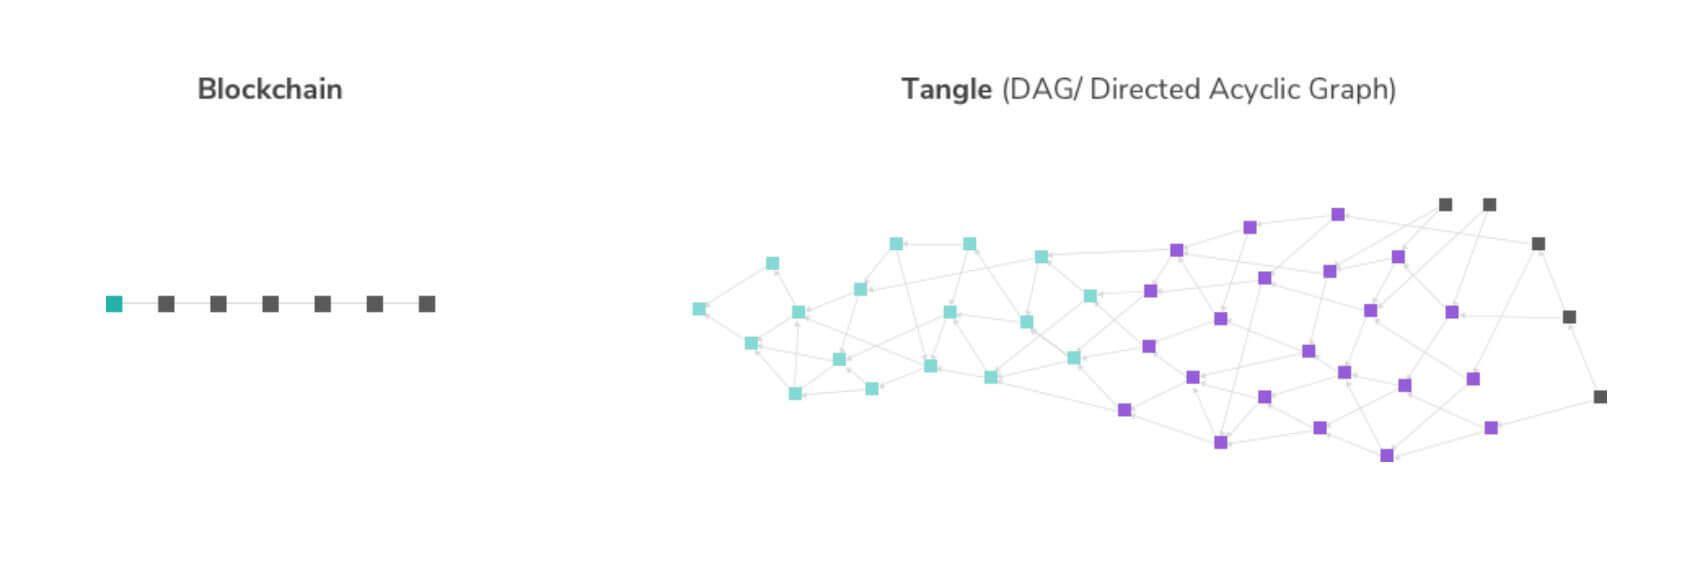 Blockchain vs Tangle